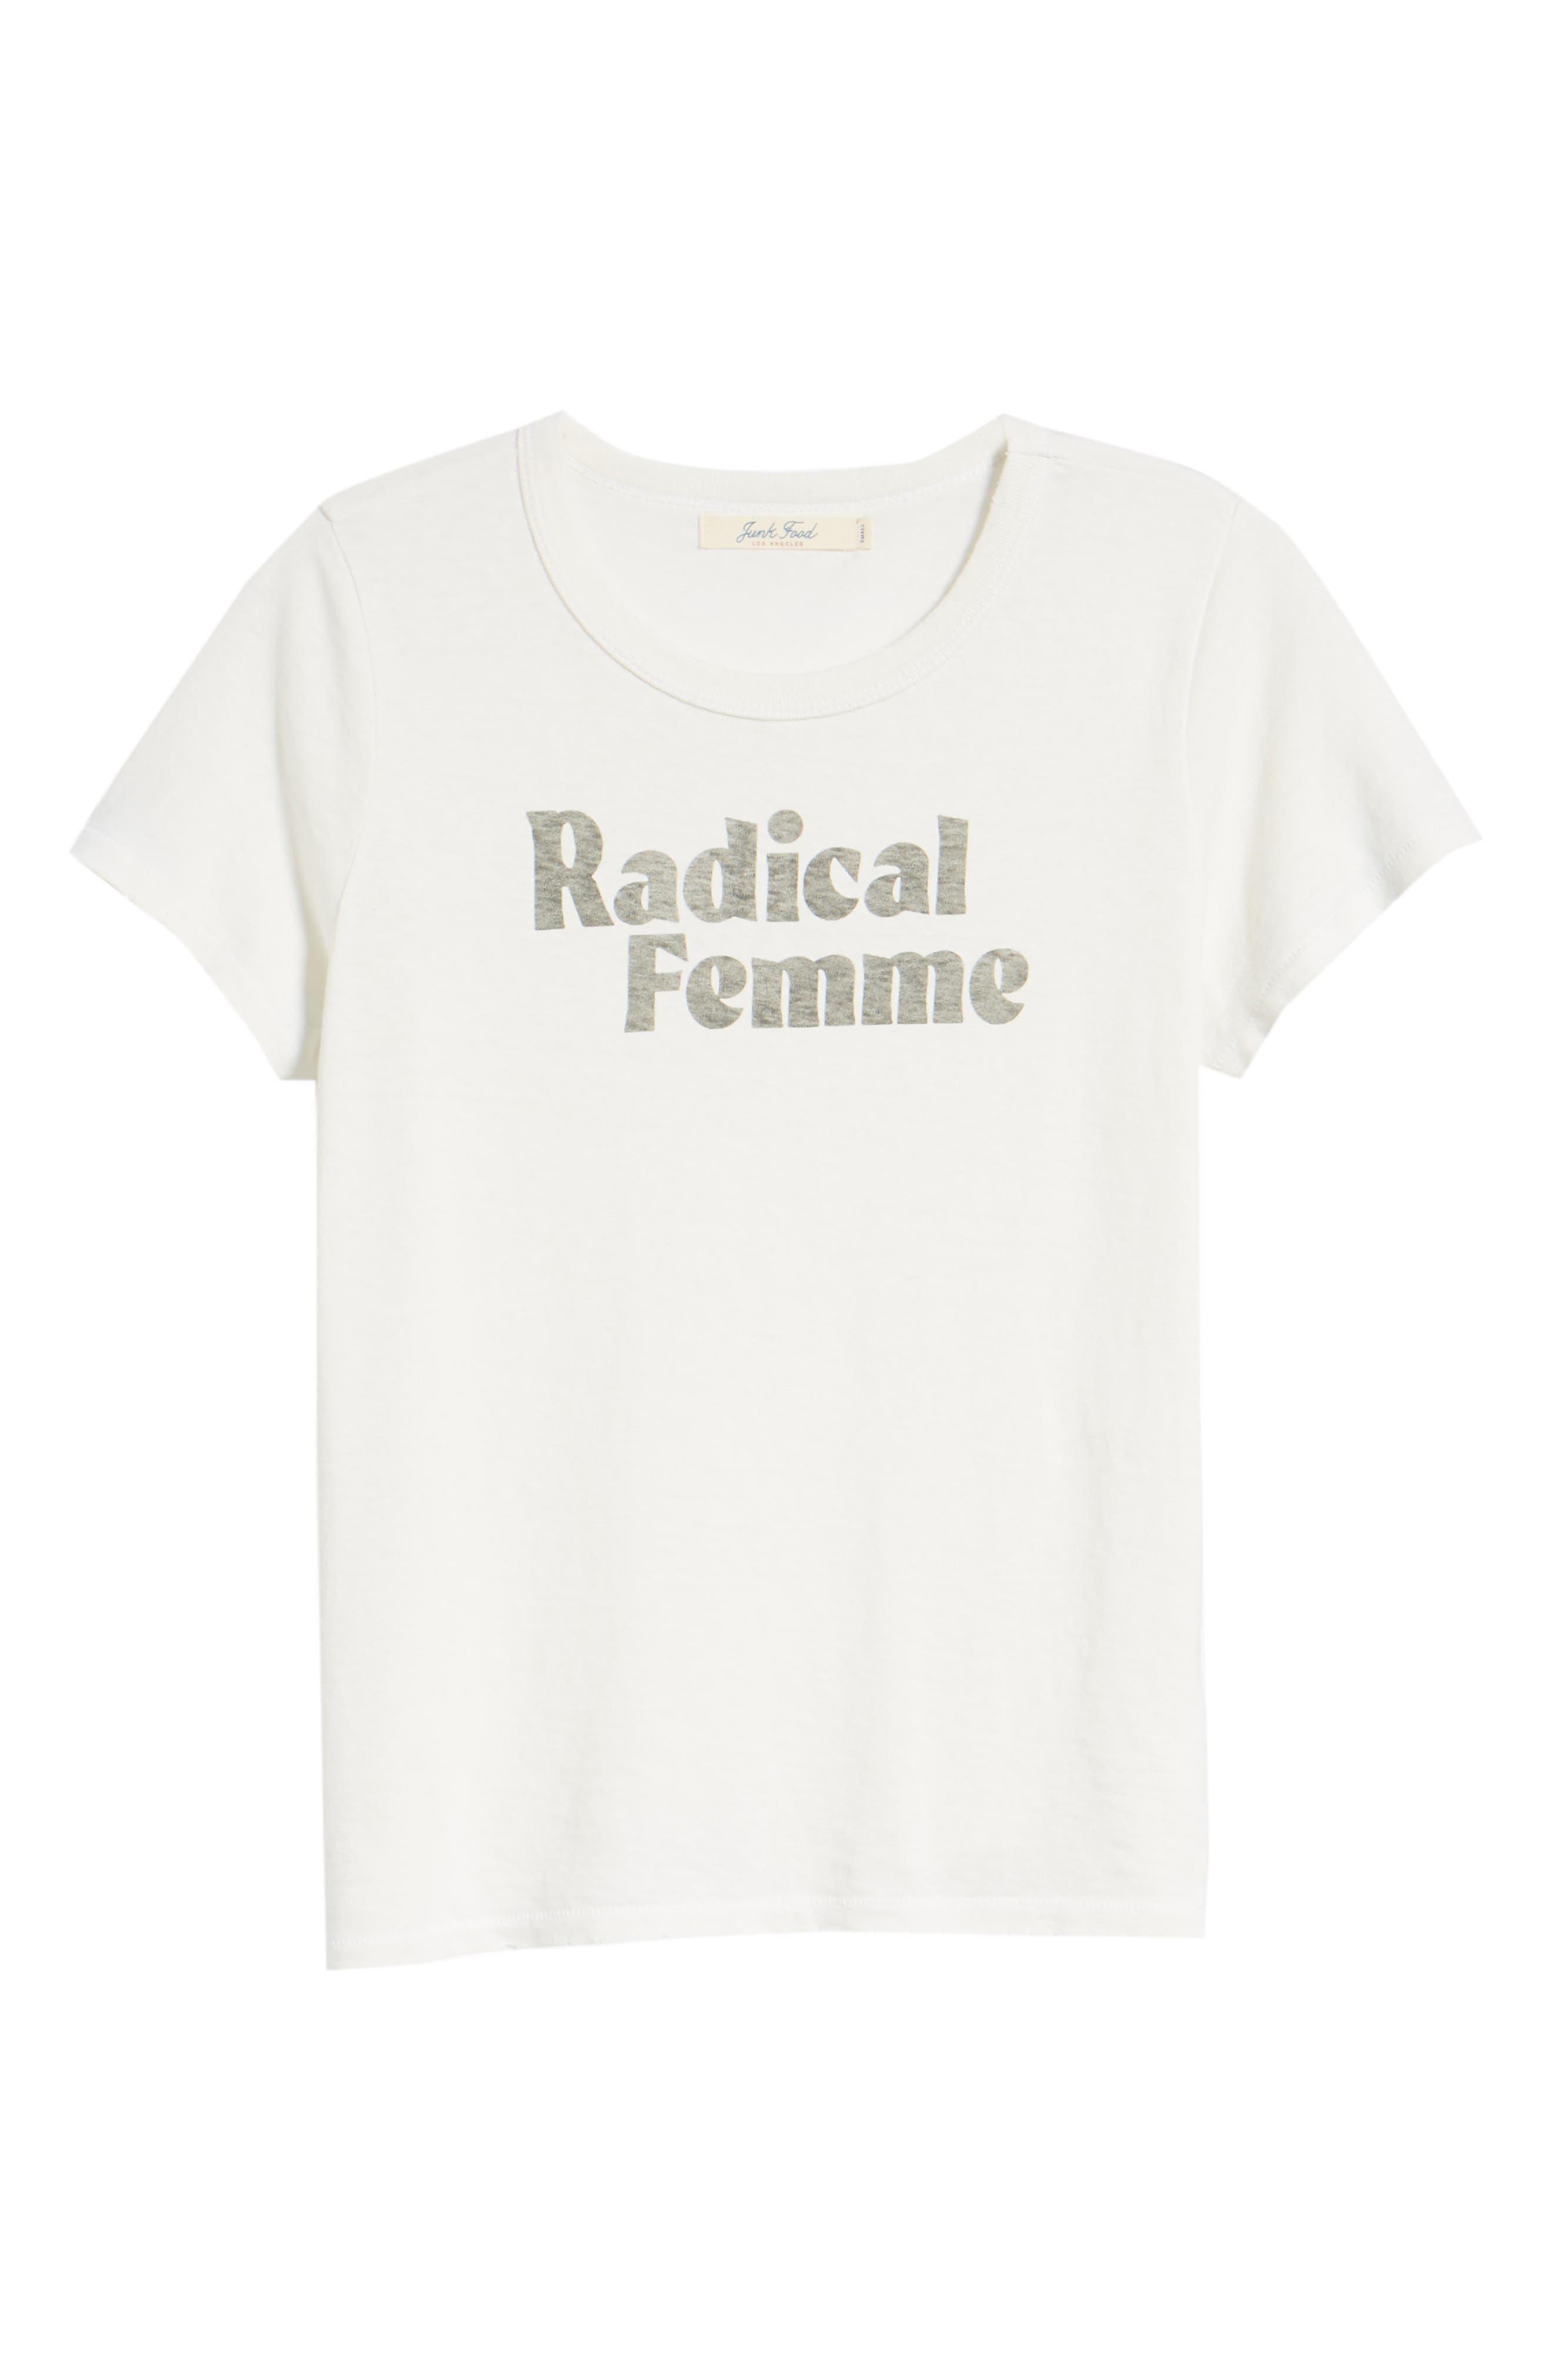 Radical Femme Tee,                             Alternate thumbnail 7, color,                             110